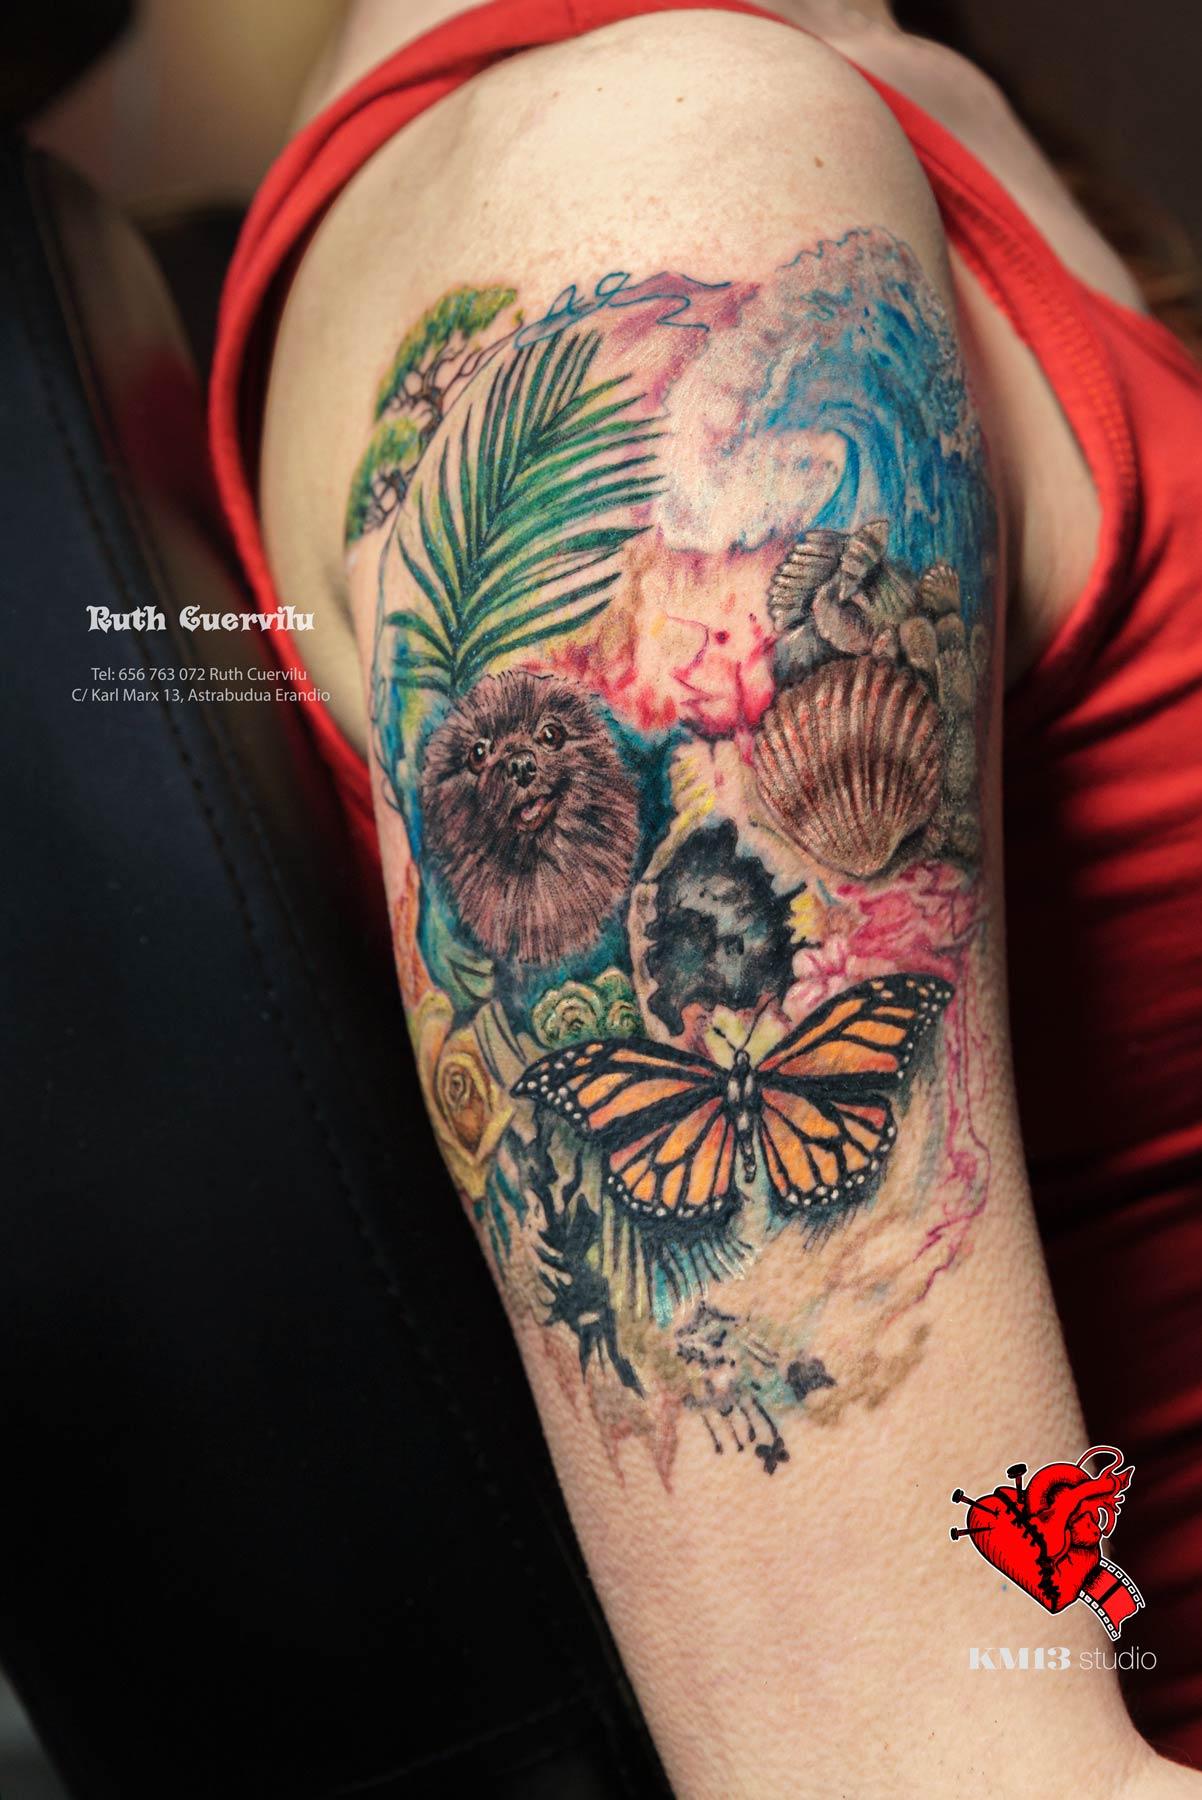 Tatuaje Calavera de colores, mariposa, retrato perro mascota, conchas - Ruth Cuervilu Tattoo - KM13 Studio - estudio de tatuajes erandio astrabudua bilbao bizkaia